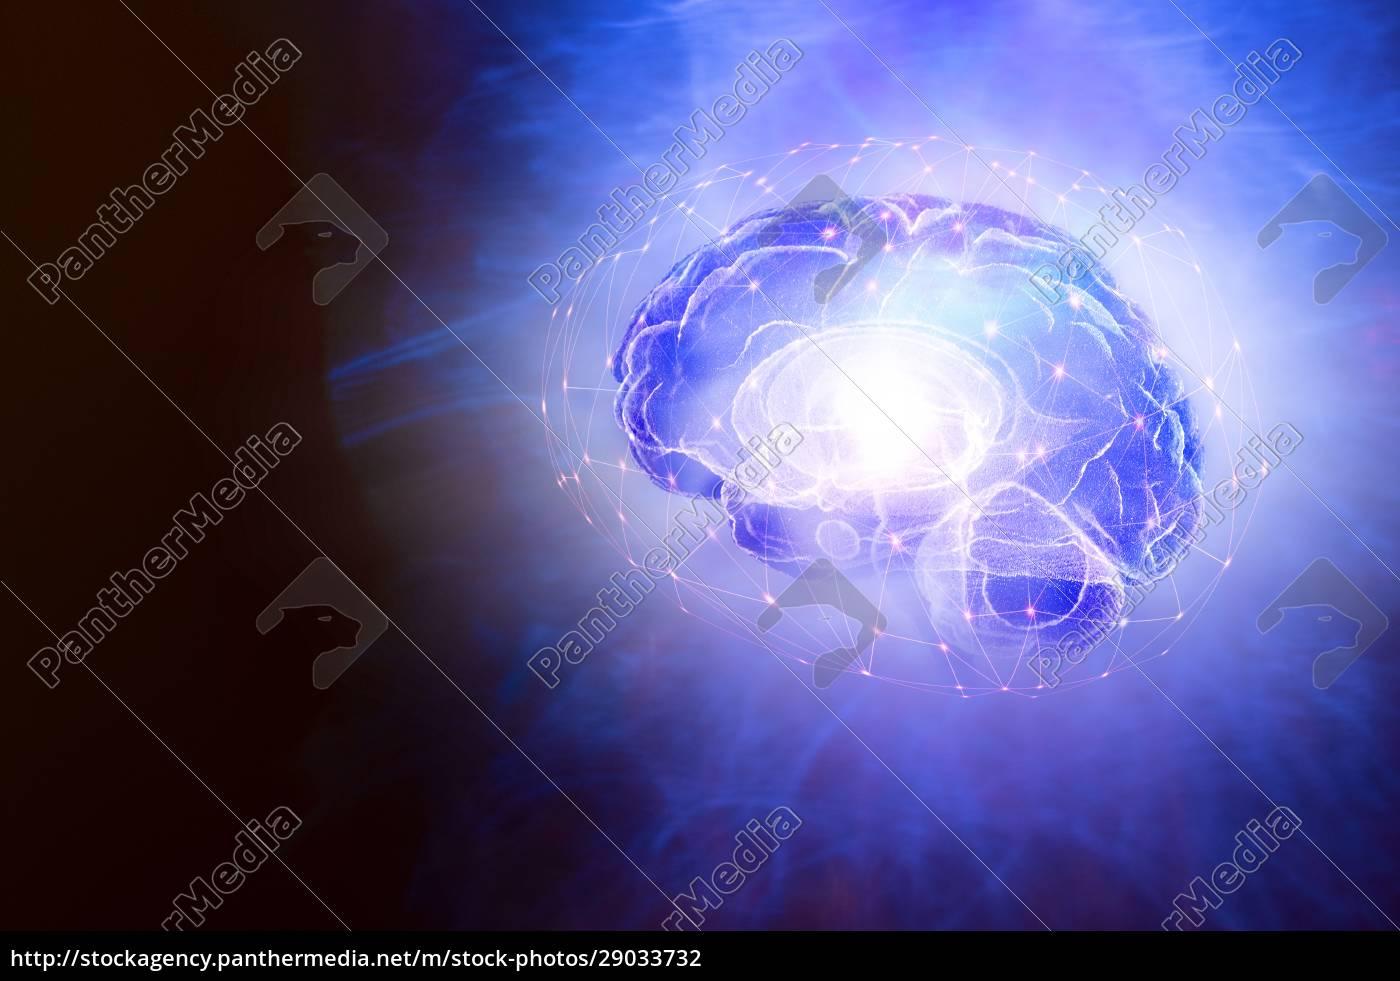 illustration, of, human, brain, and, bright - 29033732